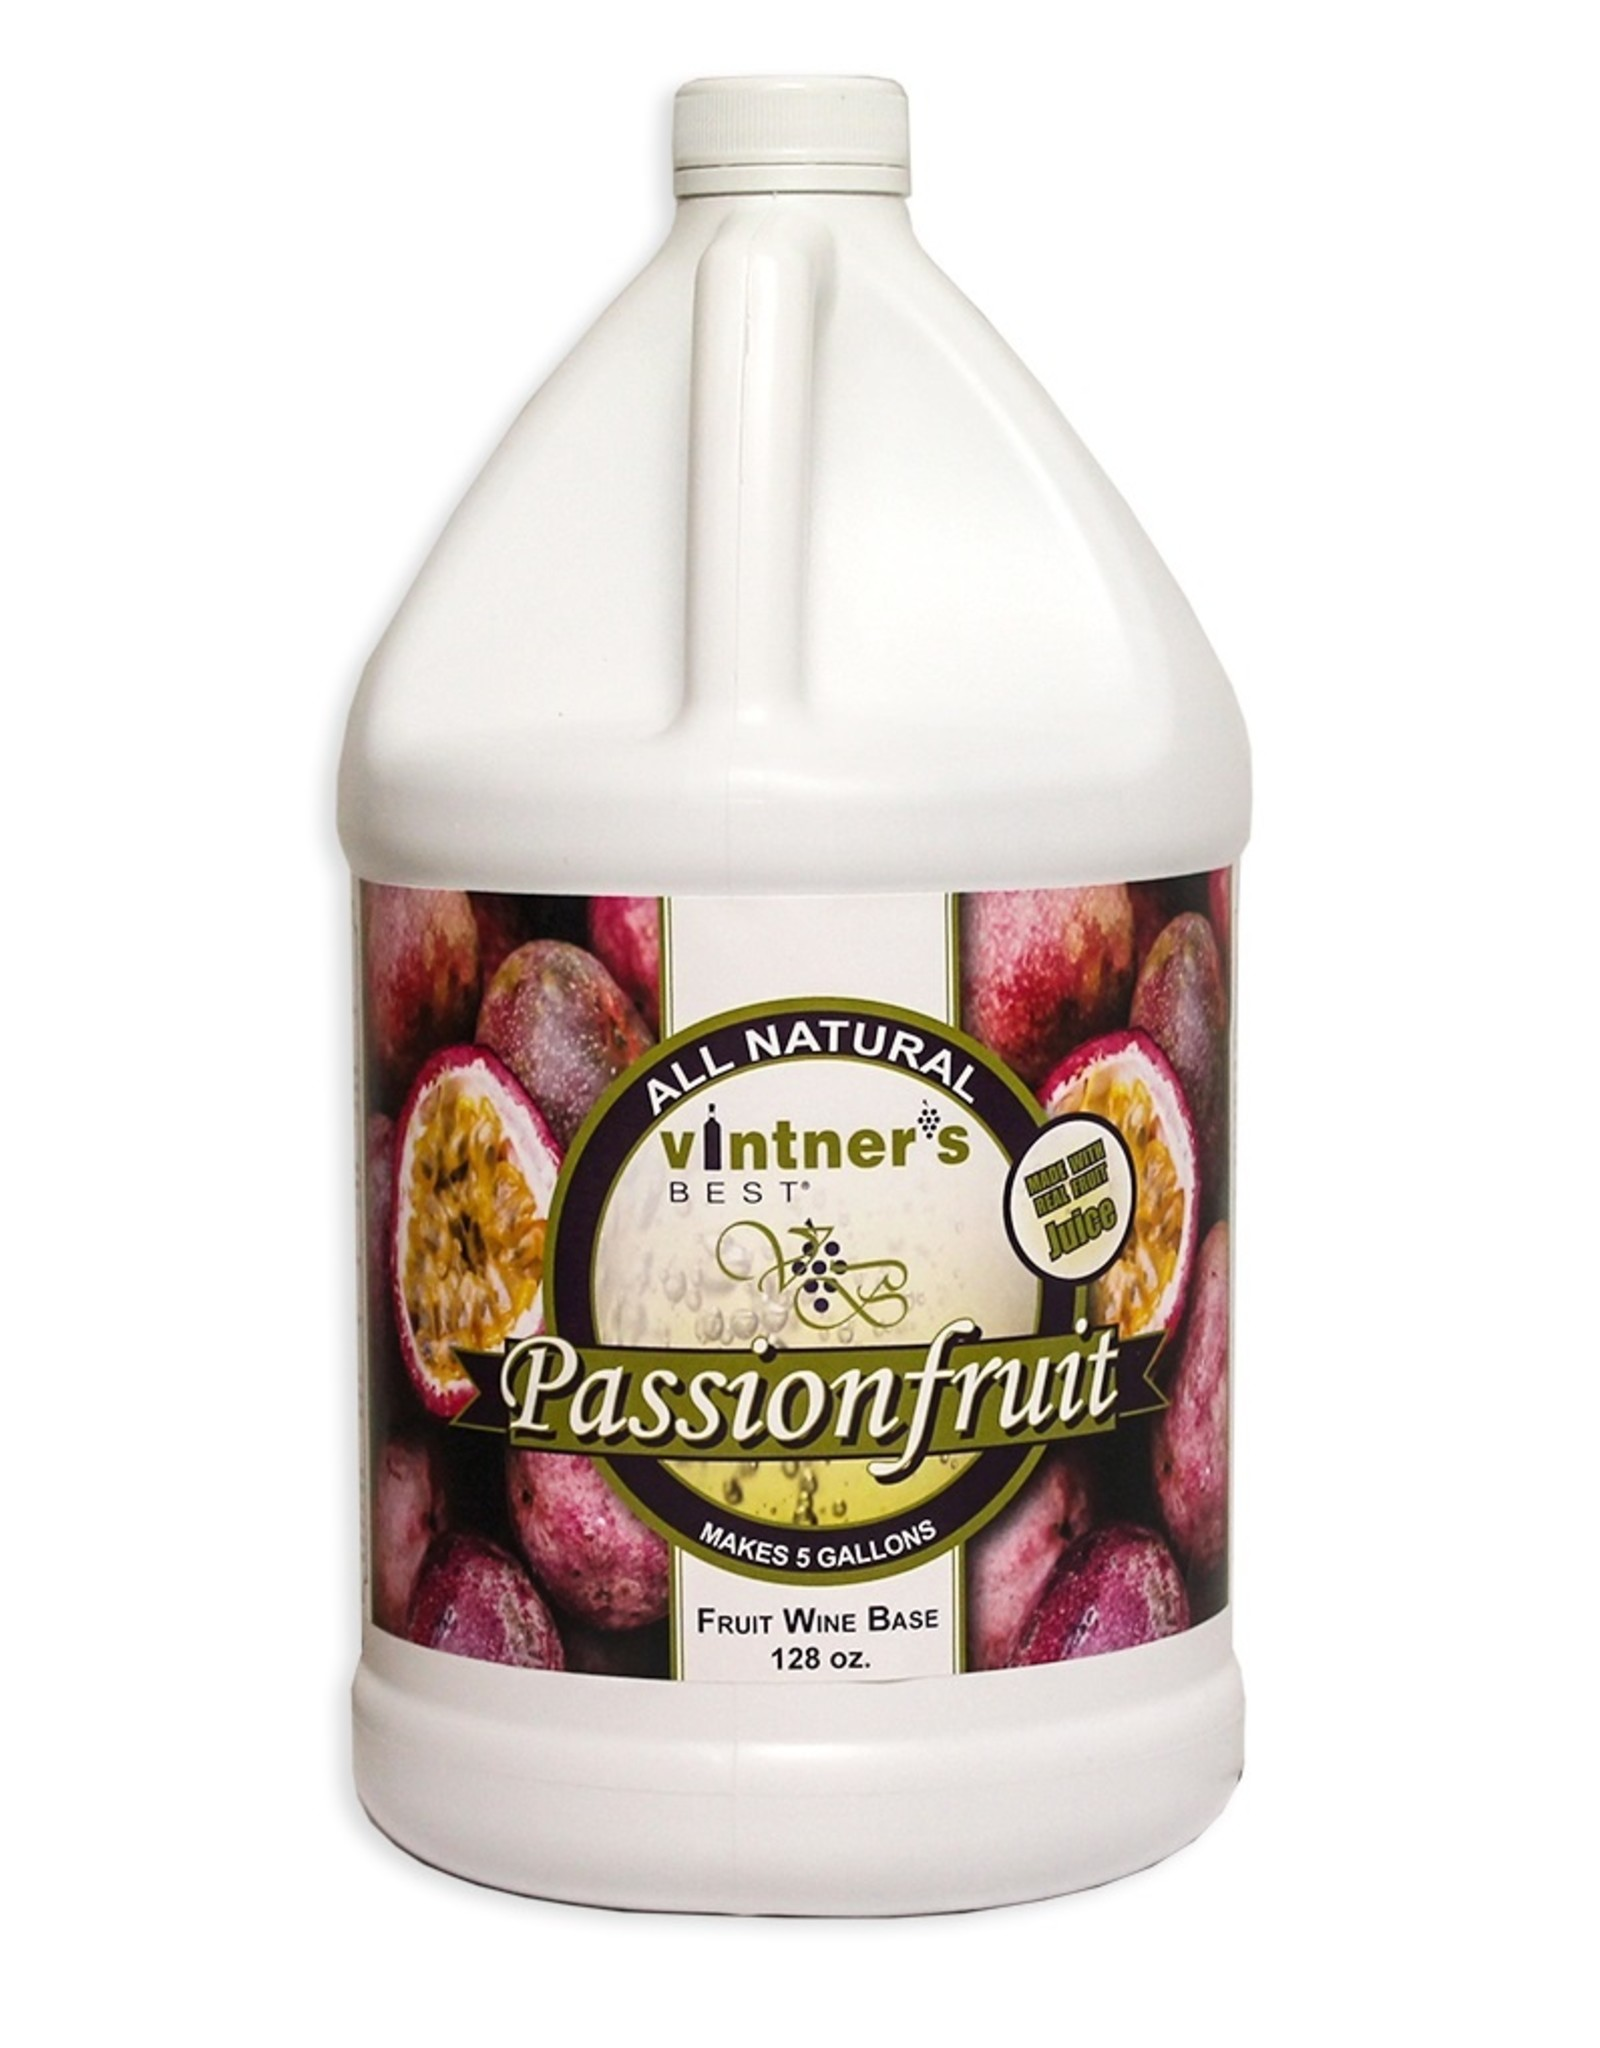 PASSIONFRUIT WINE BASE 128 OZ (1 GALLON)